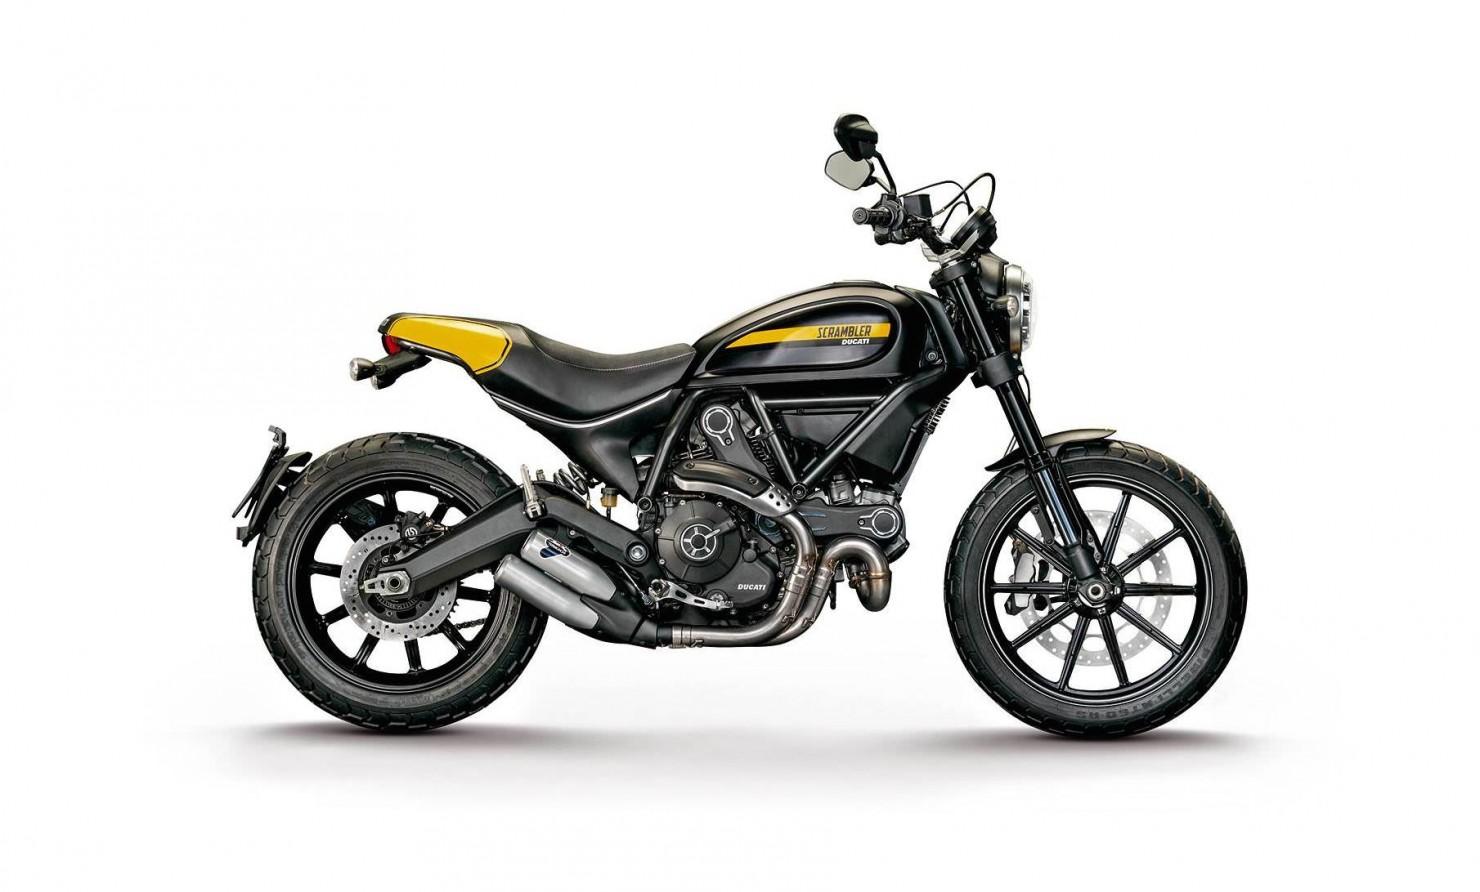 Ducati Scrambler Motorbike